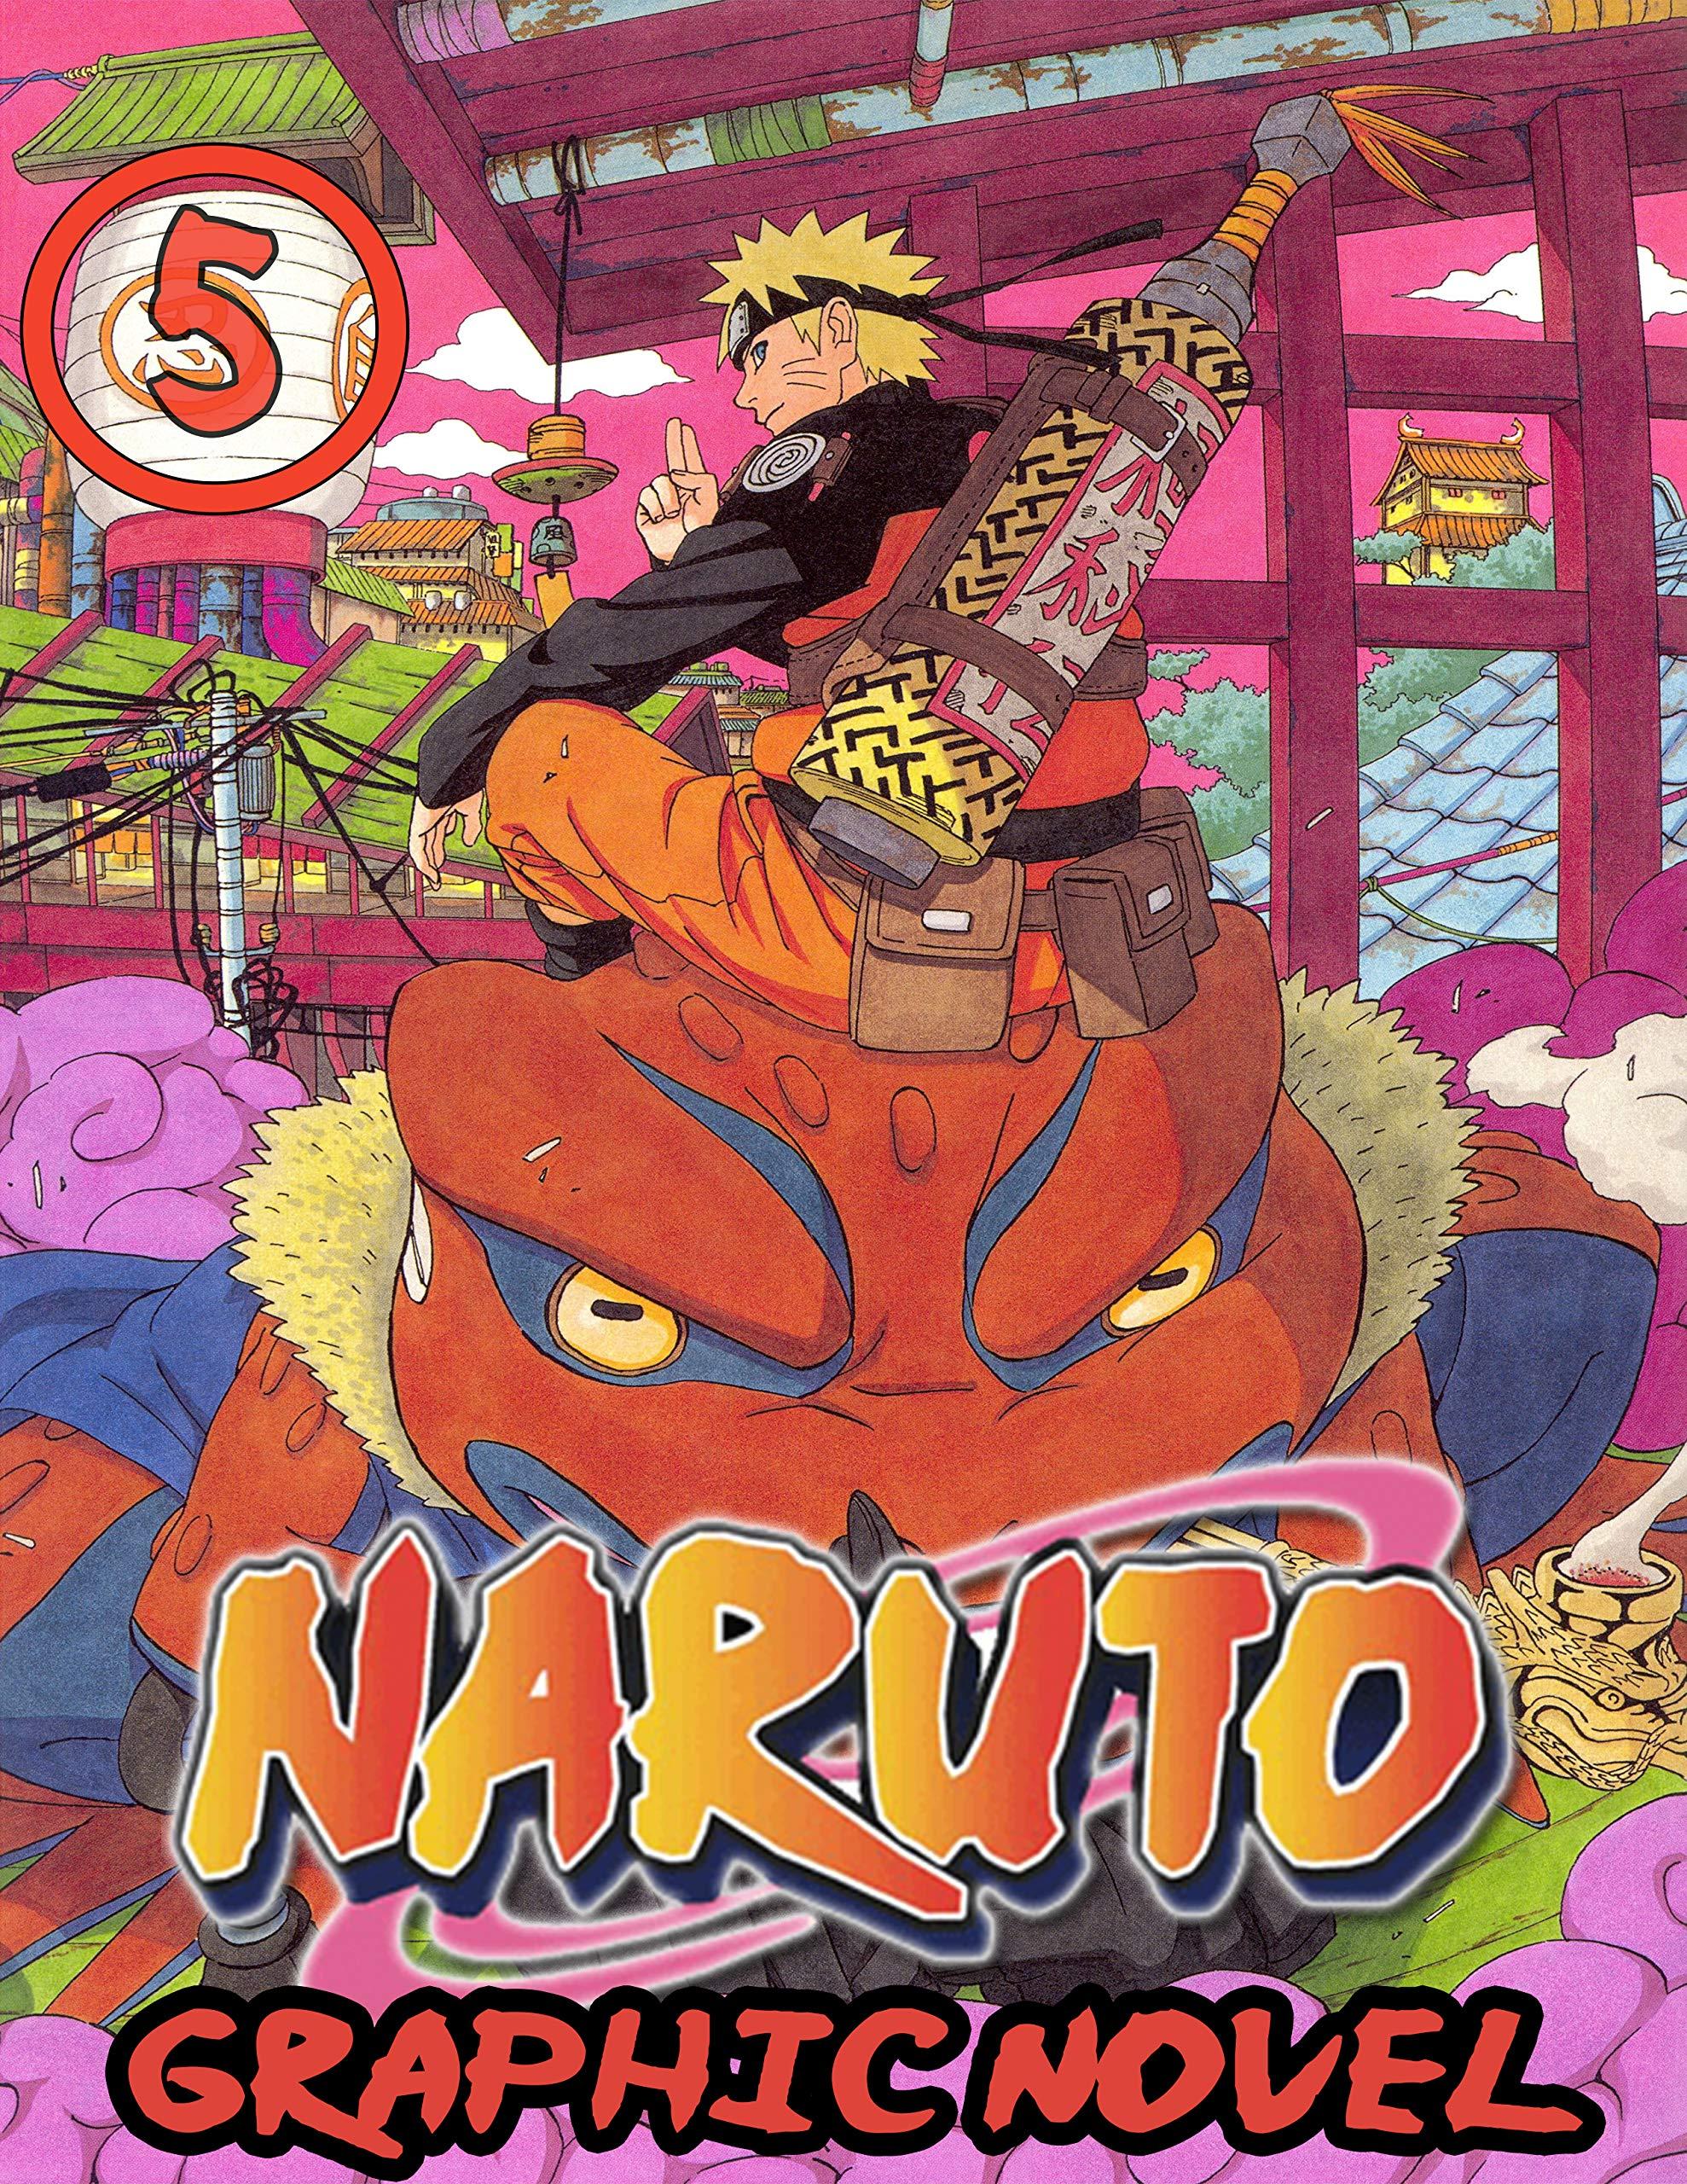 Narut Graphic Novel: Book 5 Includes Vol 13 - 14 - 15 - Great Shonen Manga Naruto Action Graphic Novel For Adults, Teenagers, Kids, Manga Lover